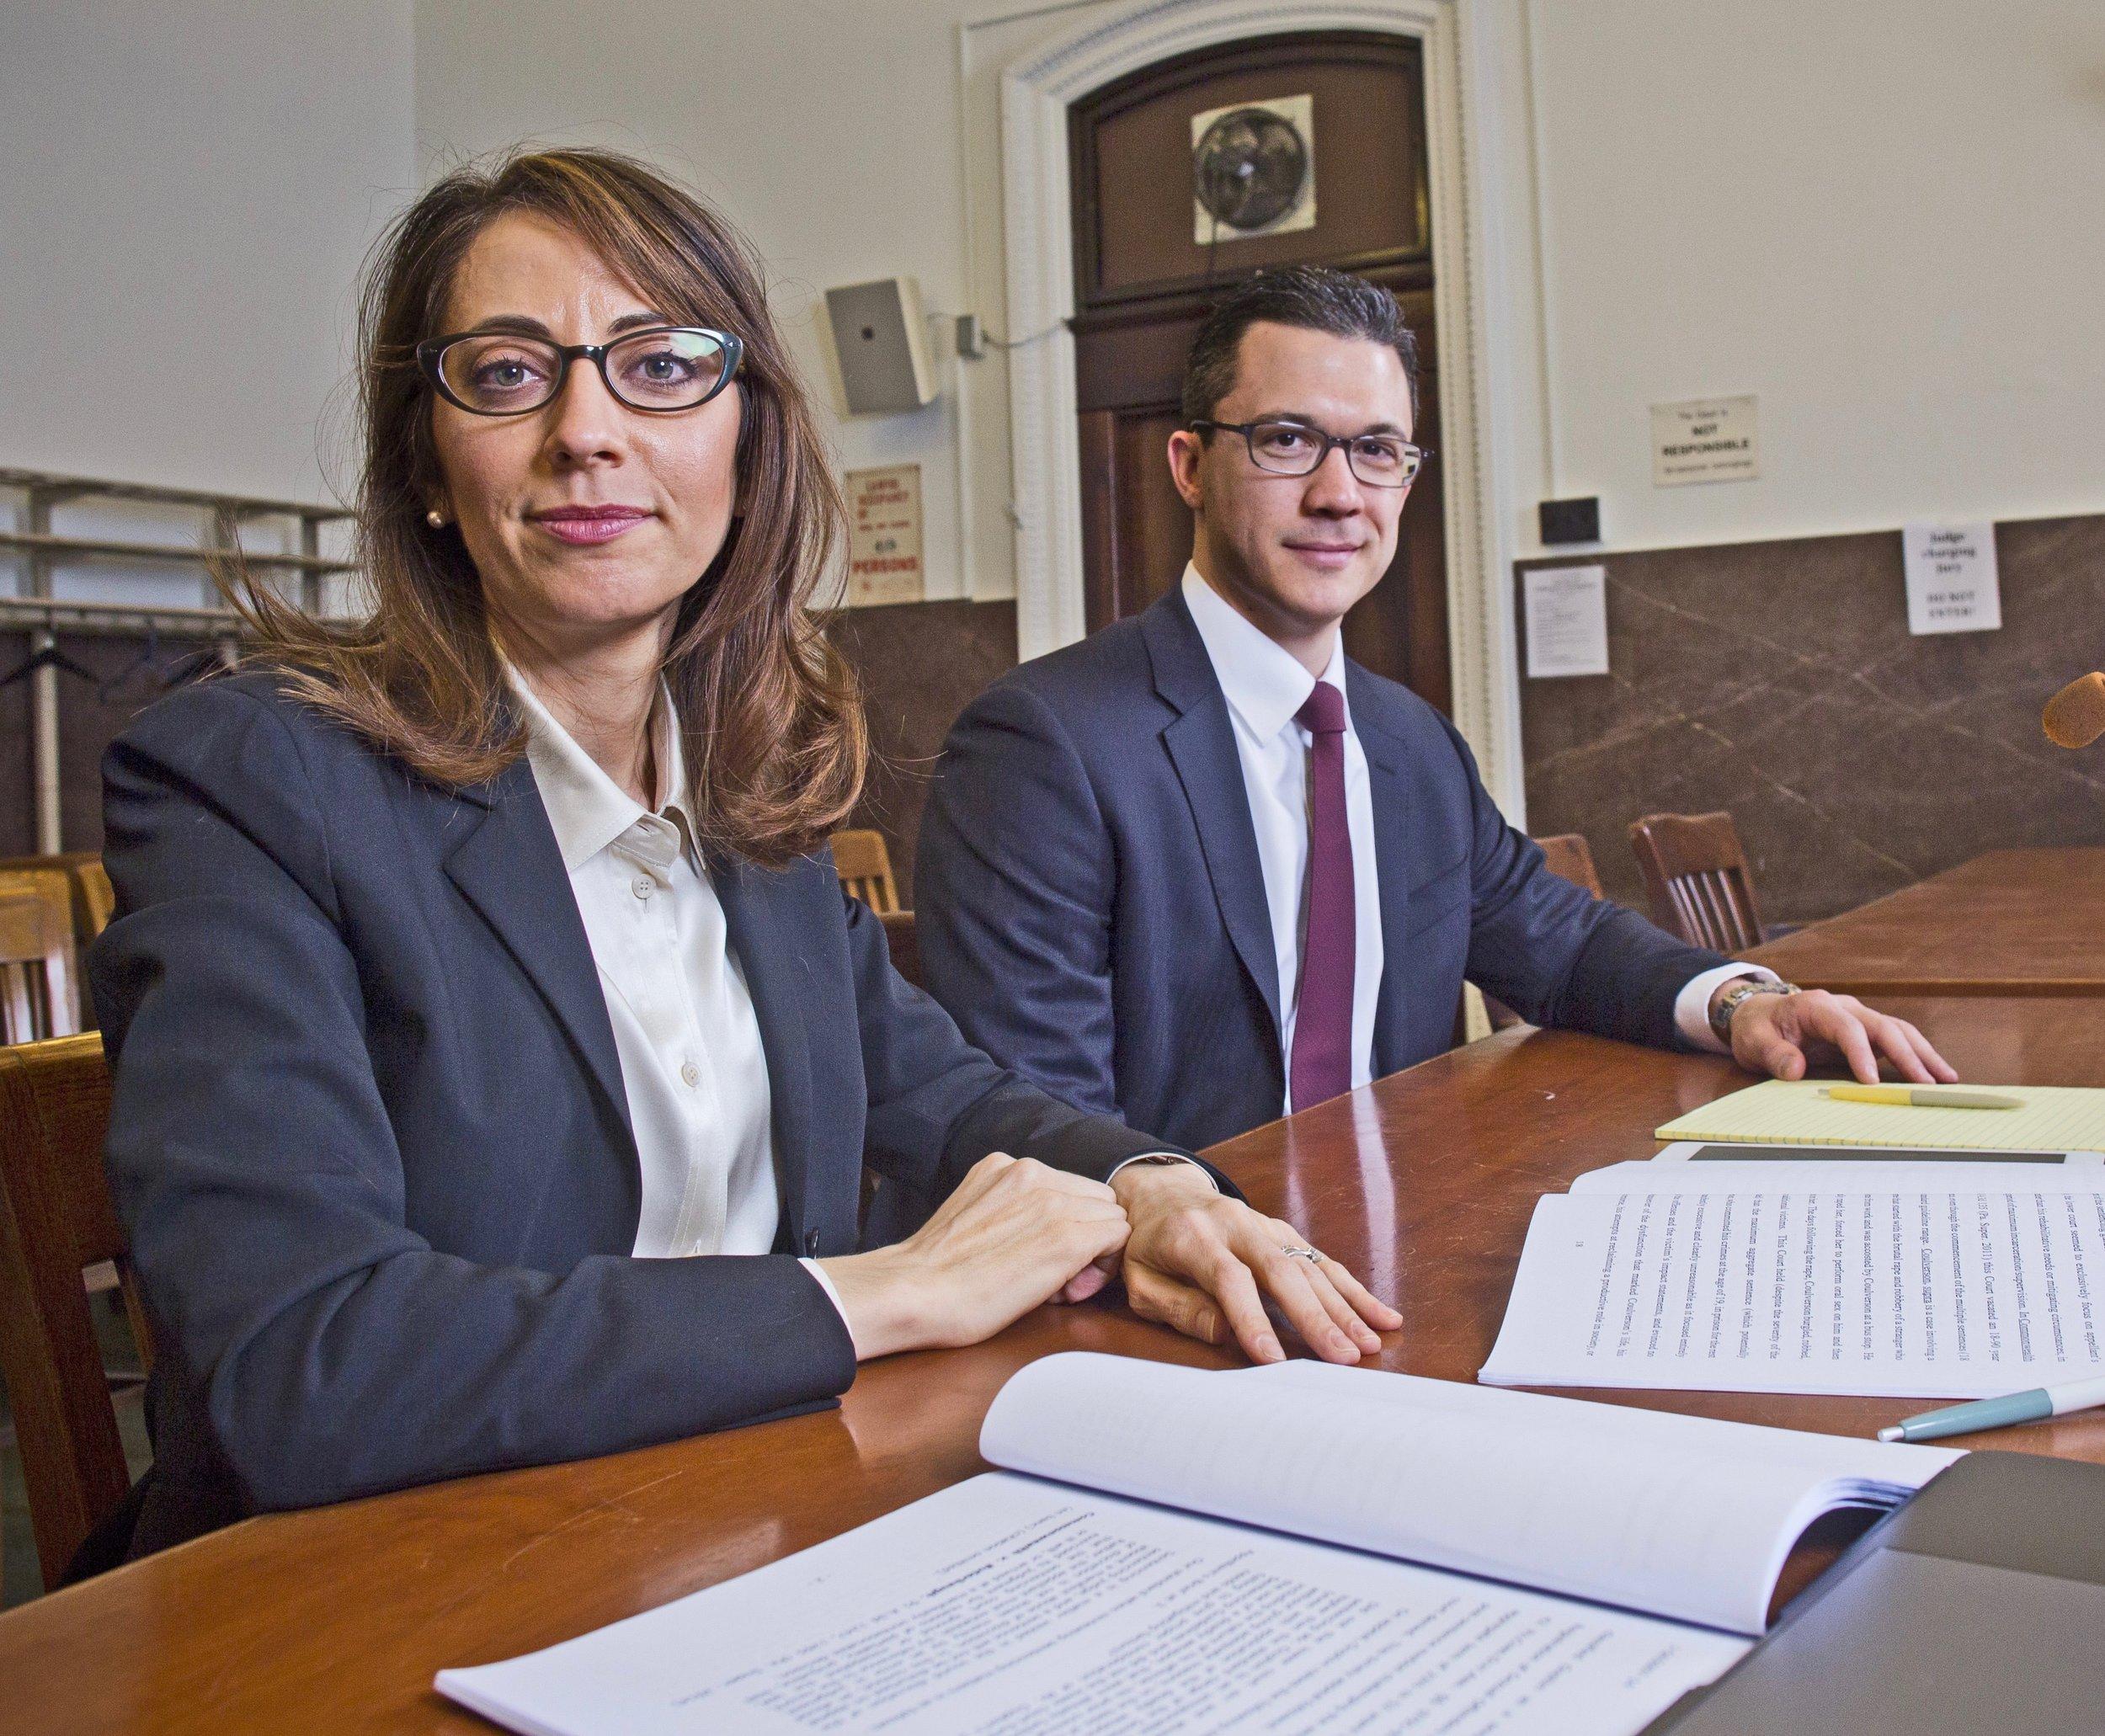 Philadelphia Criminal Defense Lawyers Zak Goldstein and Demetra Mehta